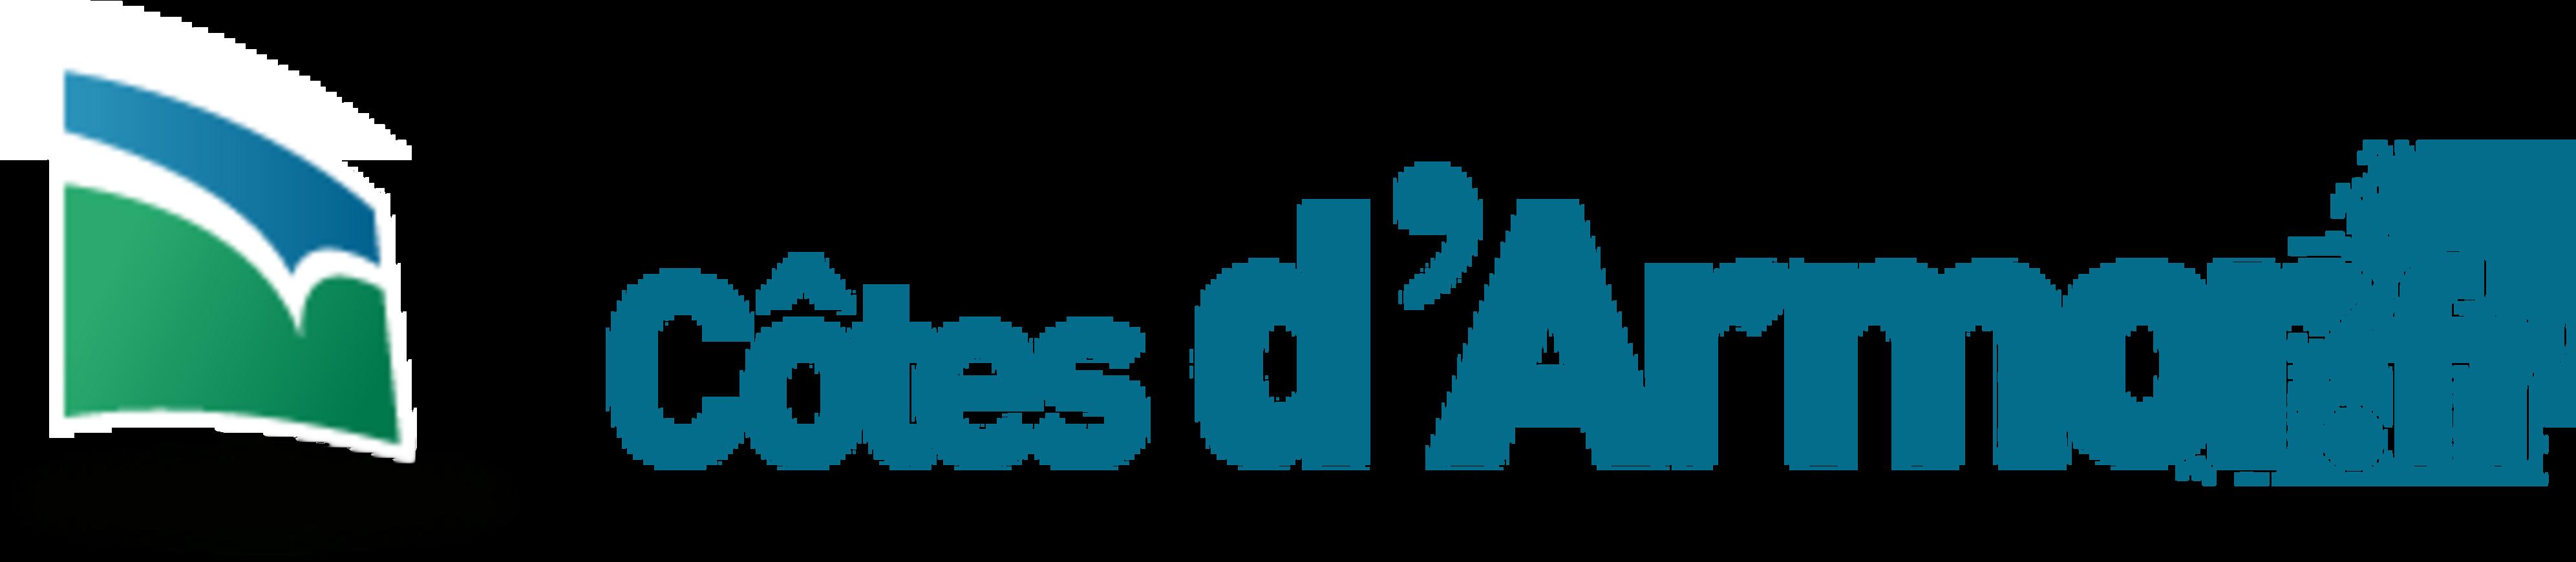 Les transports scolaires et les Tibus seront suspendus demain matin. 0